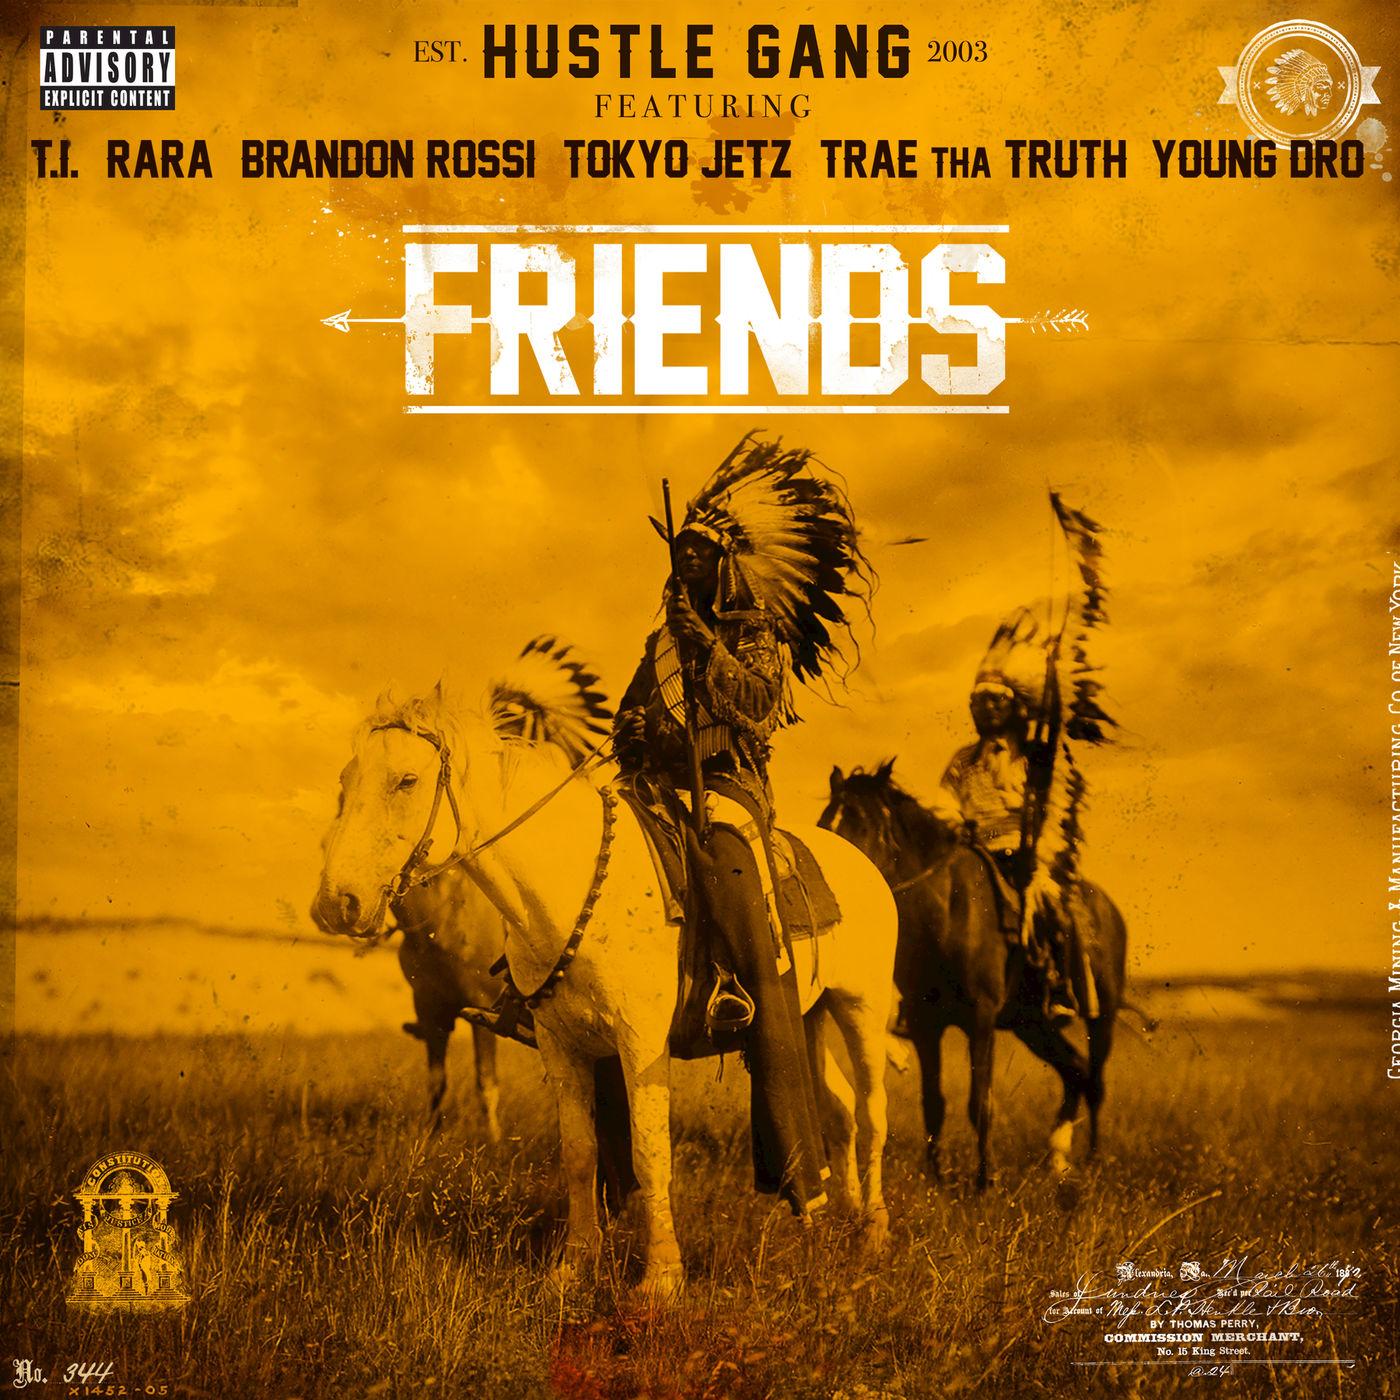 Hustle Gang - Friends (feat. T.I., Rara, Brandon Rossi, Tokyo Jetz, Trae tha Truth & Young Dro) - Single Cover